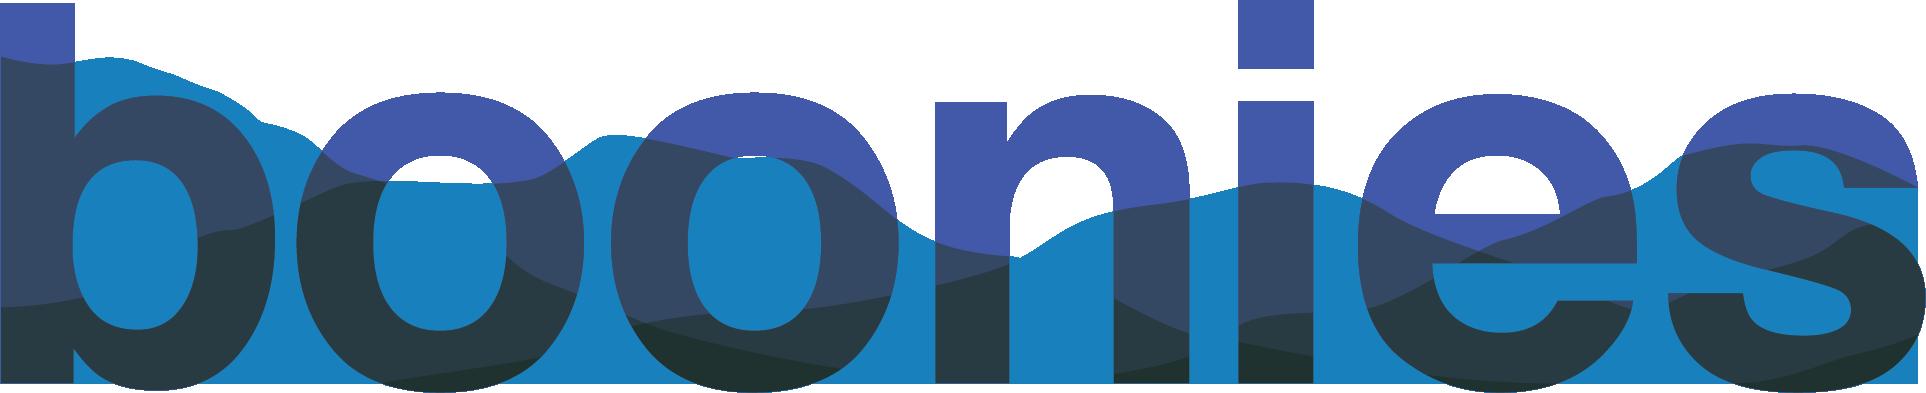 boonies logo_dark mtns_FINAL_RGB.png